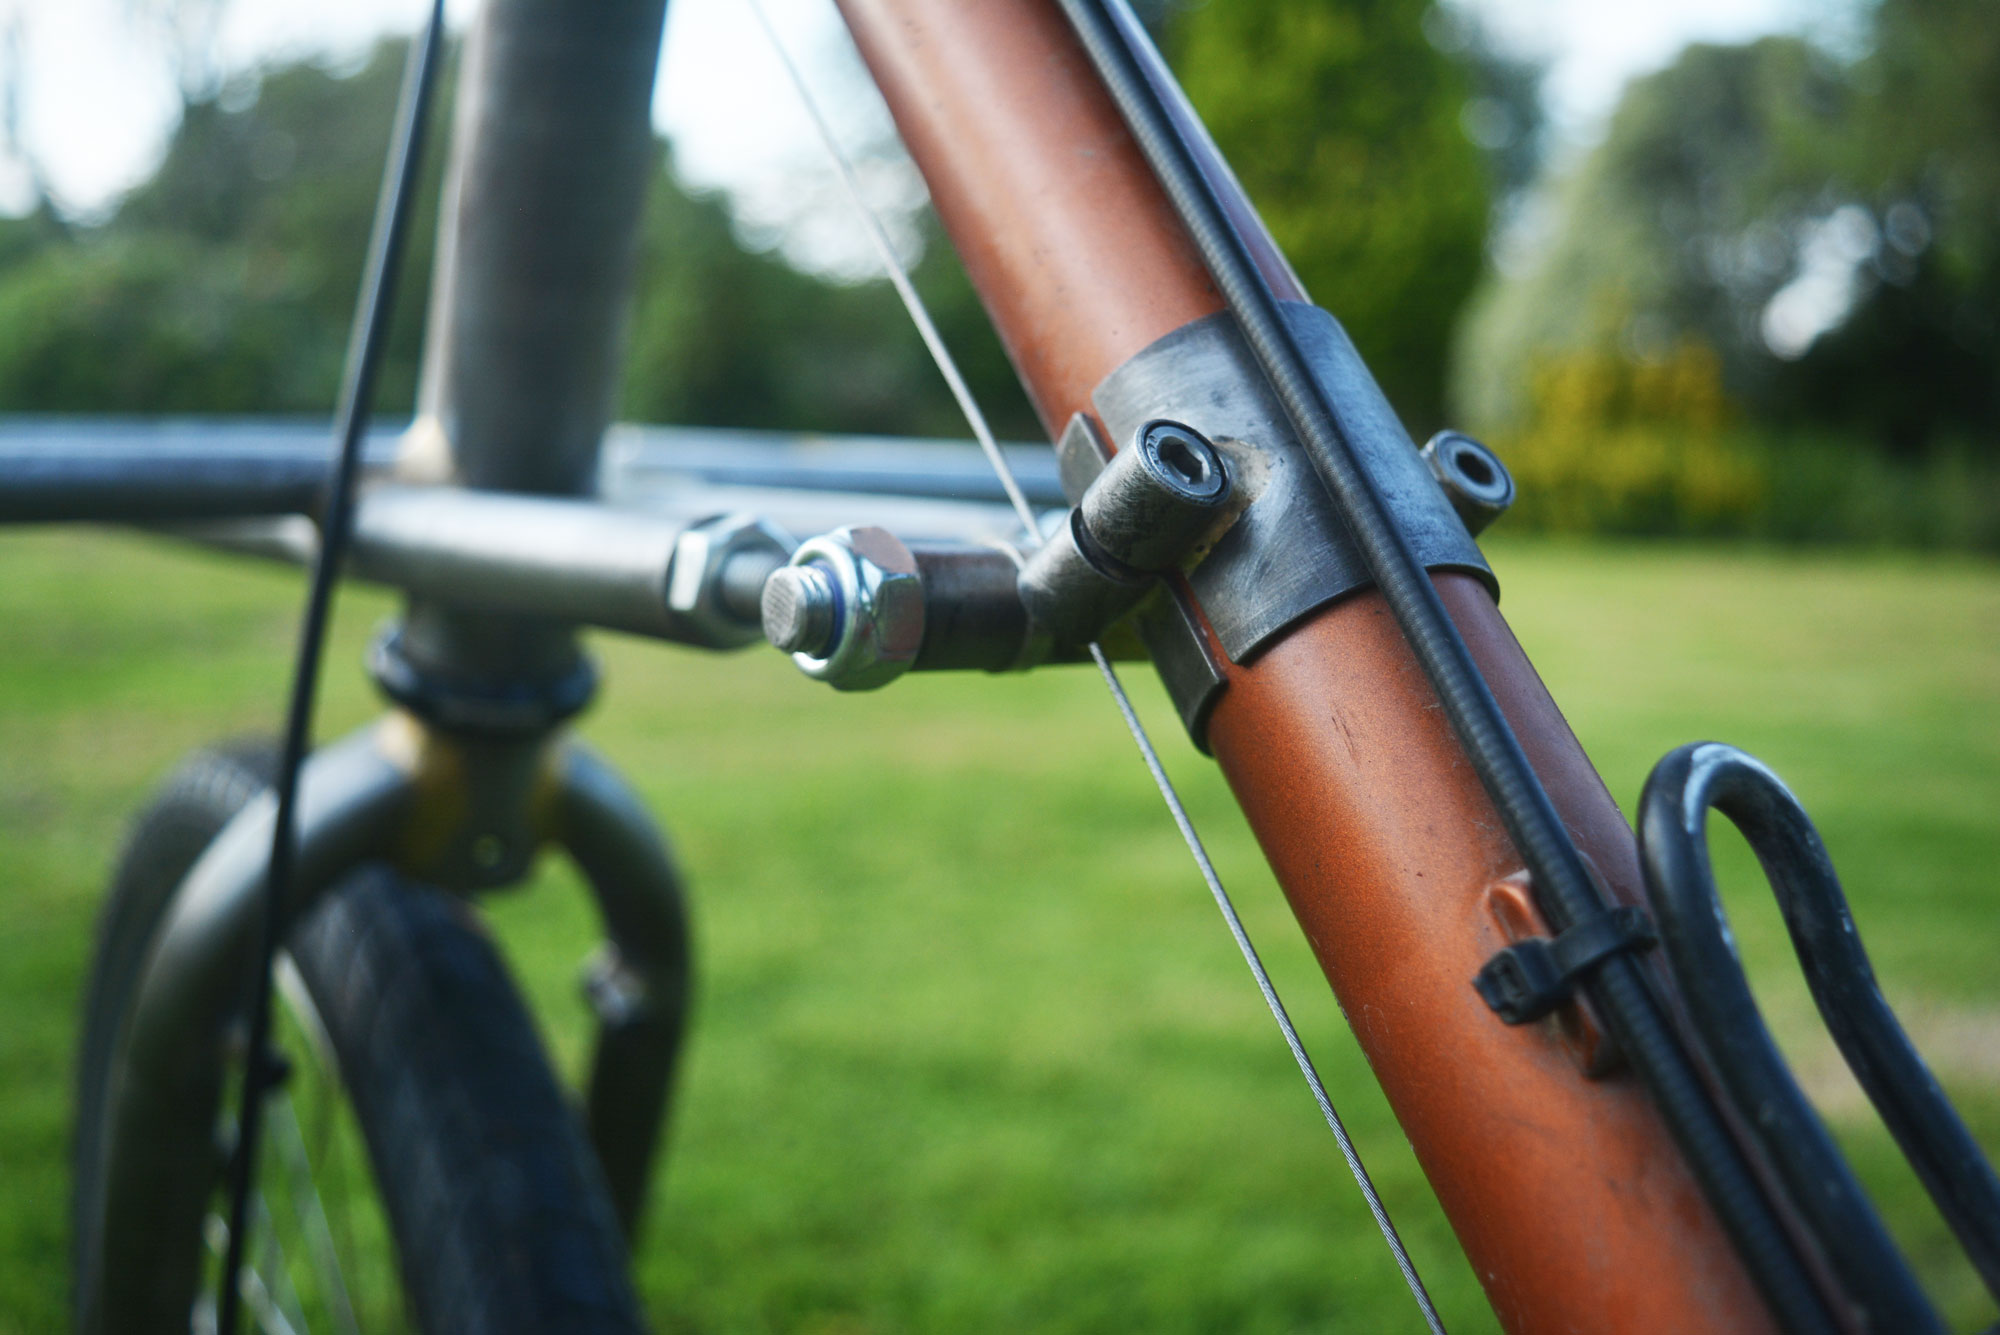 Vélo Taillefer Cycles, Pierre Glottin, RKR